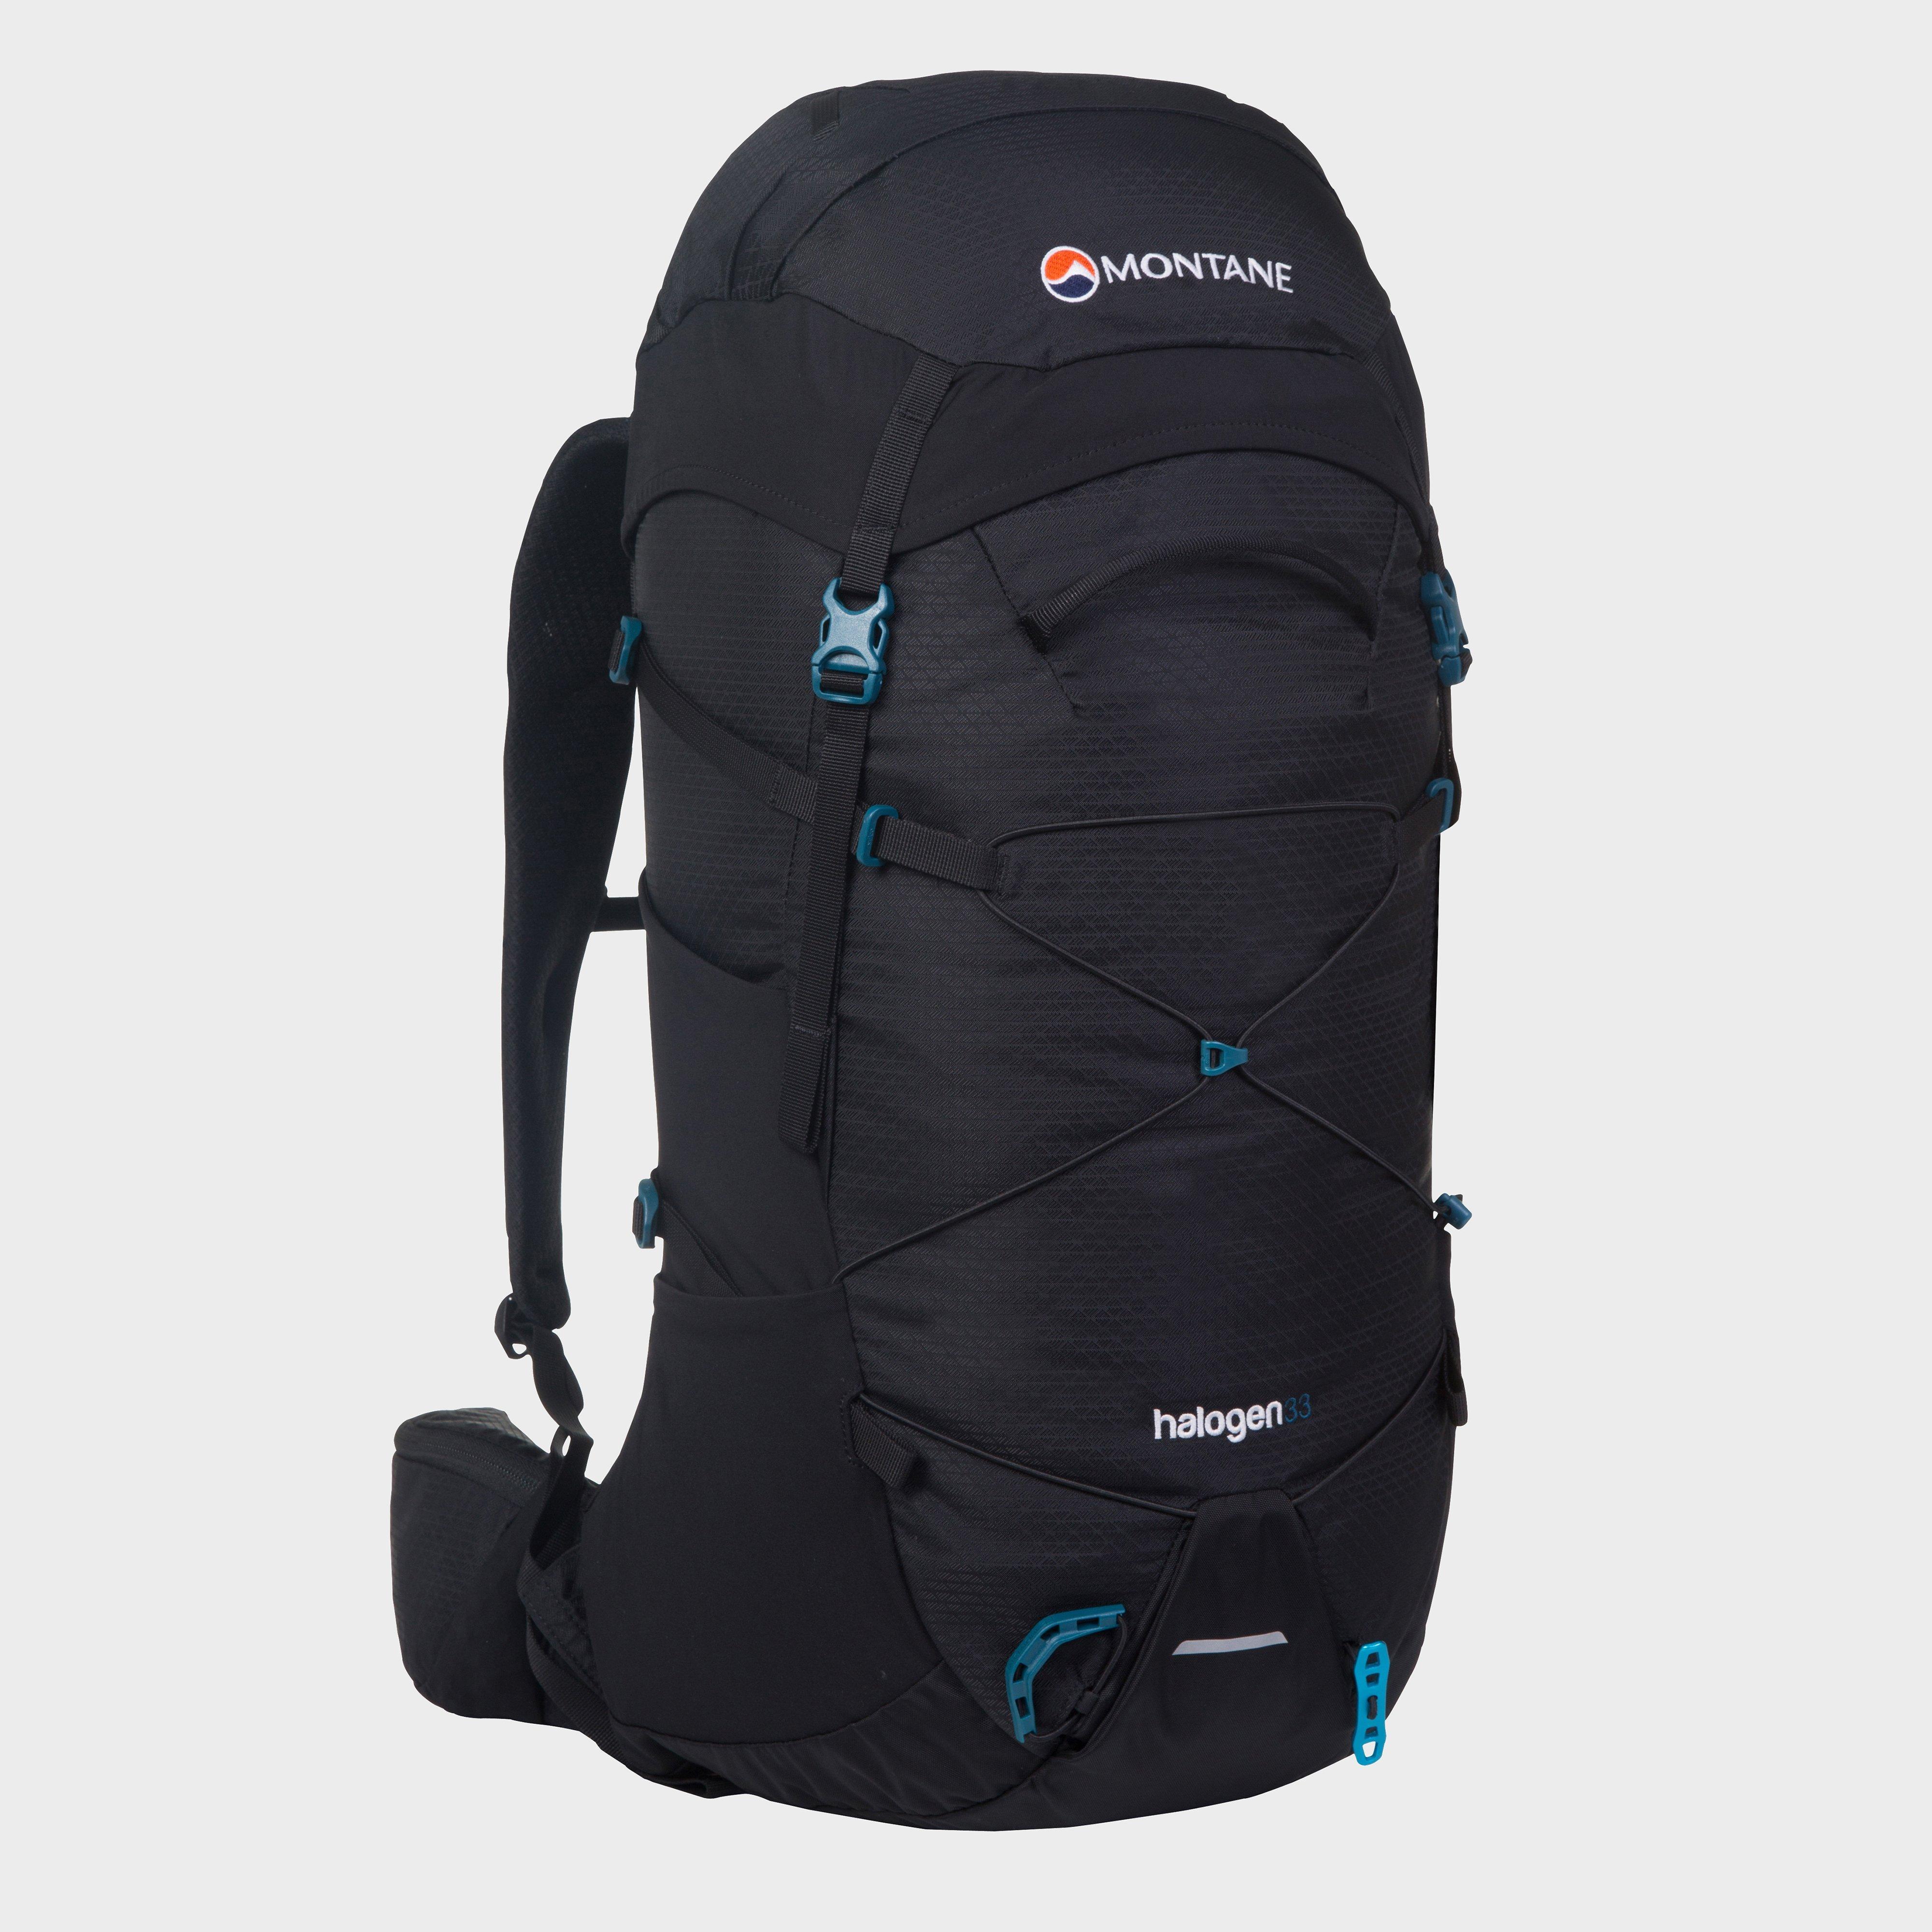 Montane Halogen 33 Daypack - Black, Black